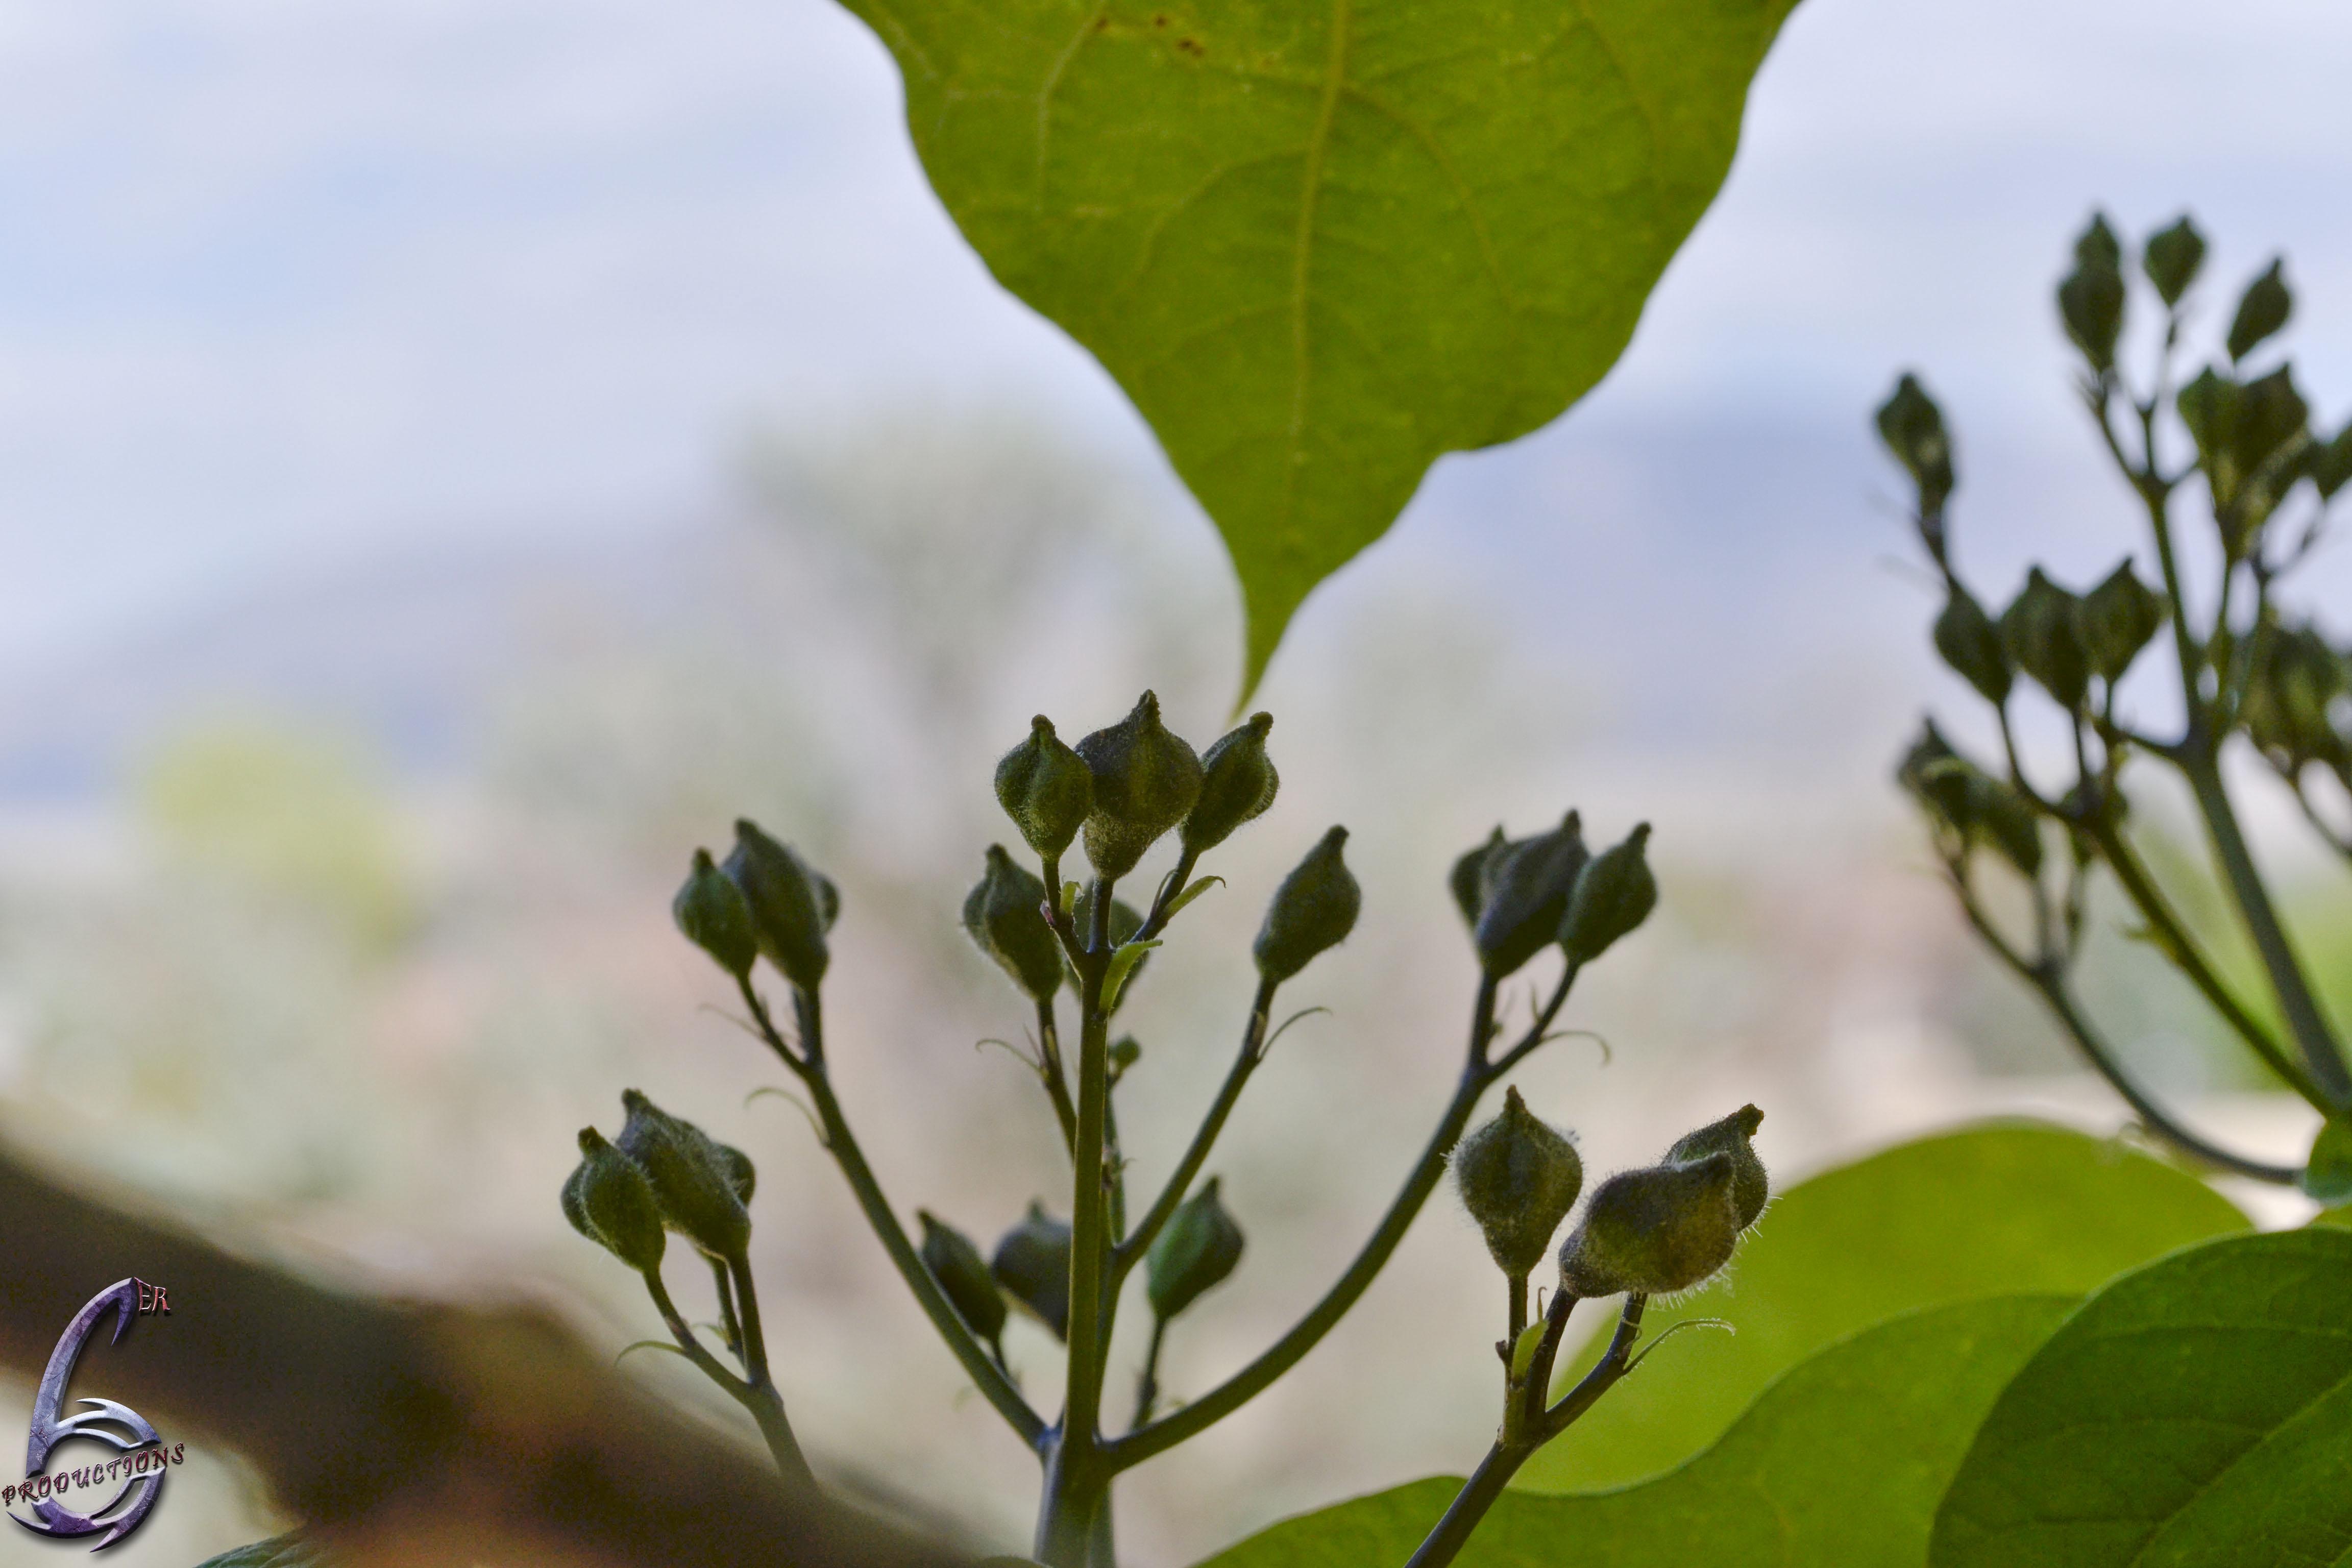 Budding Flower